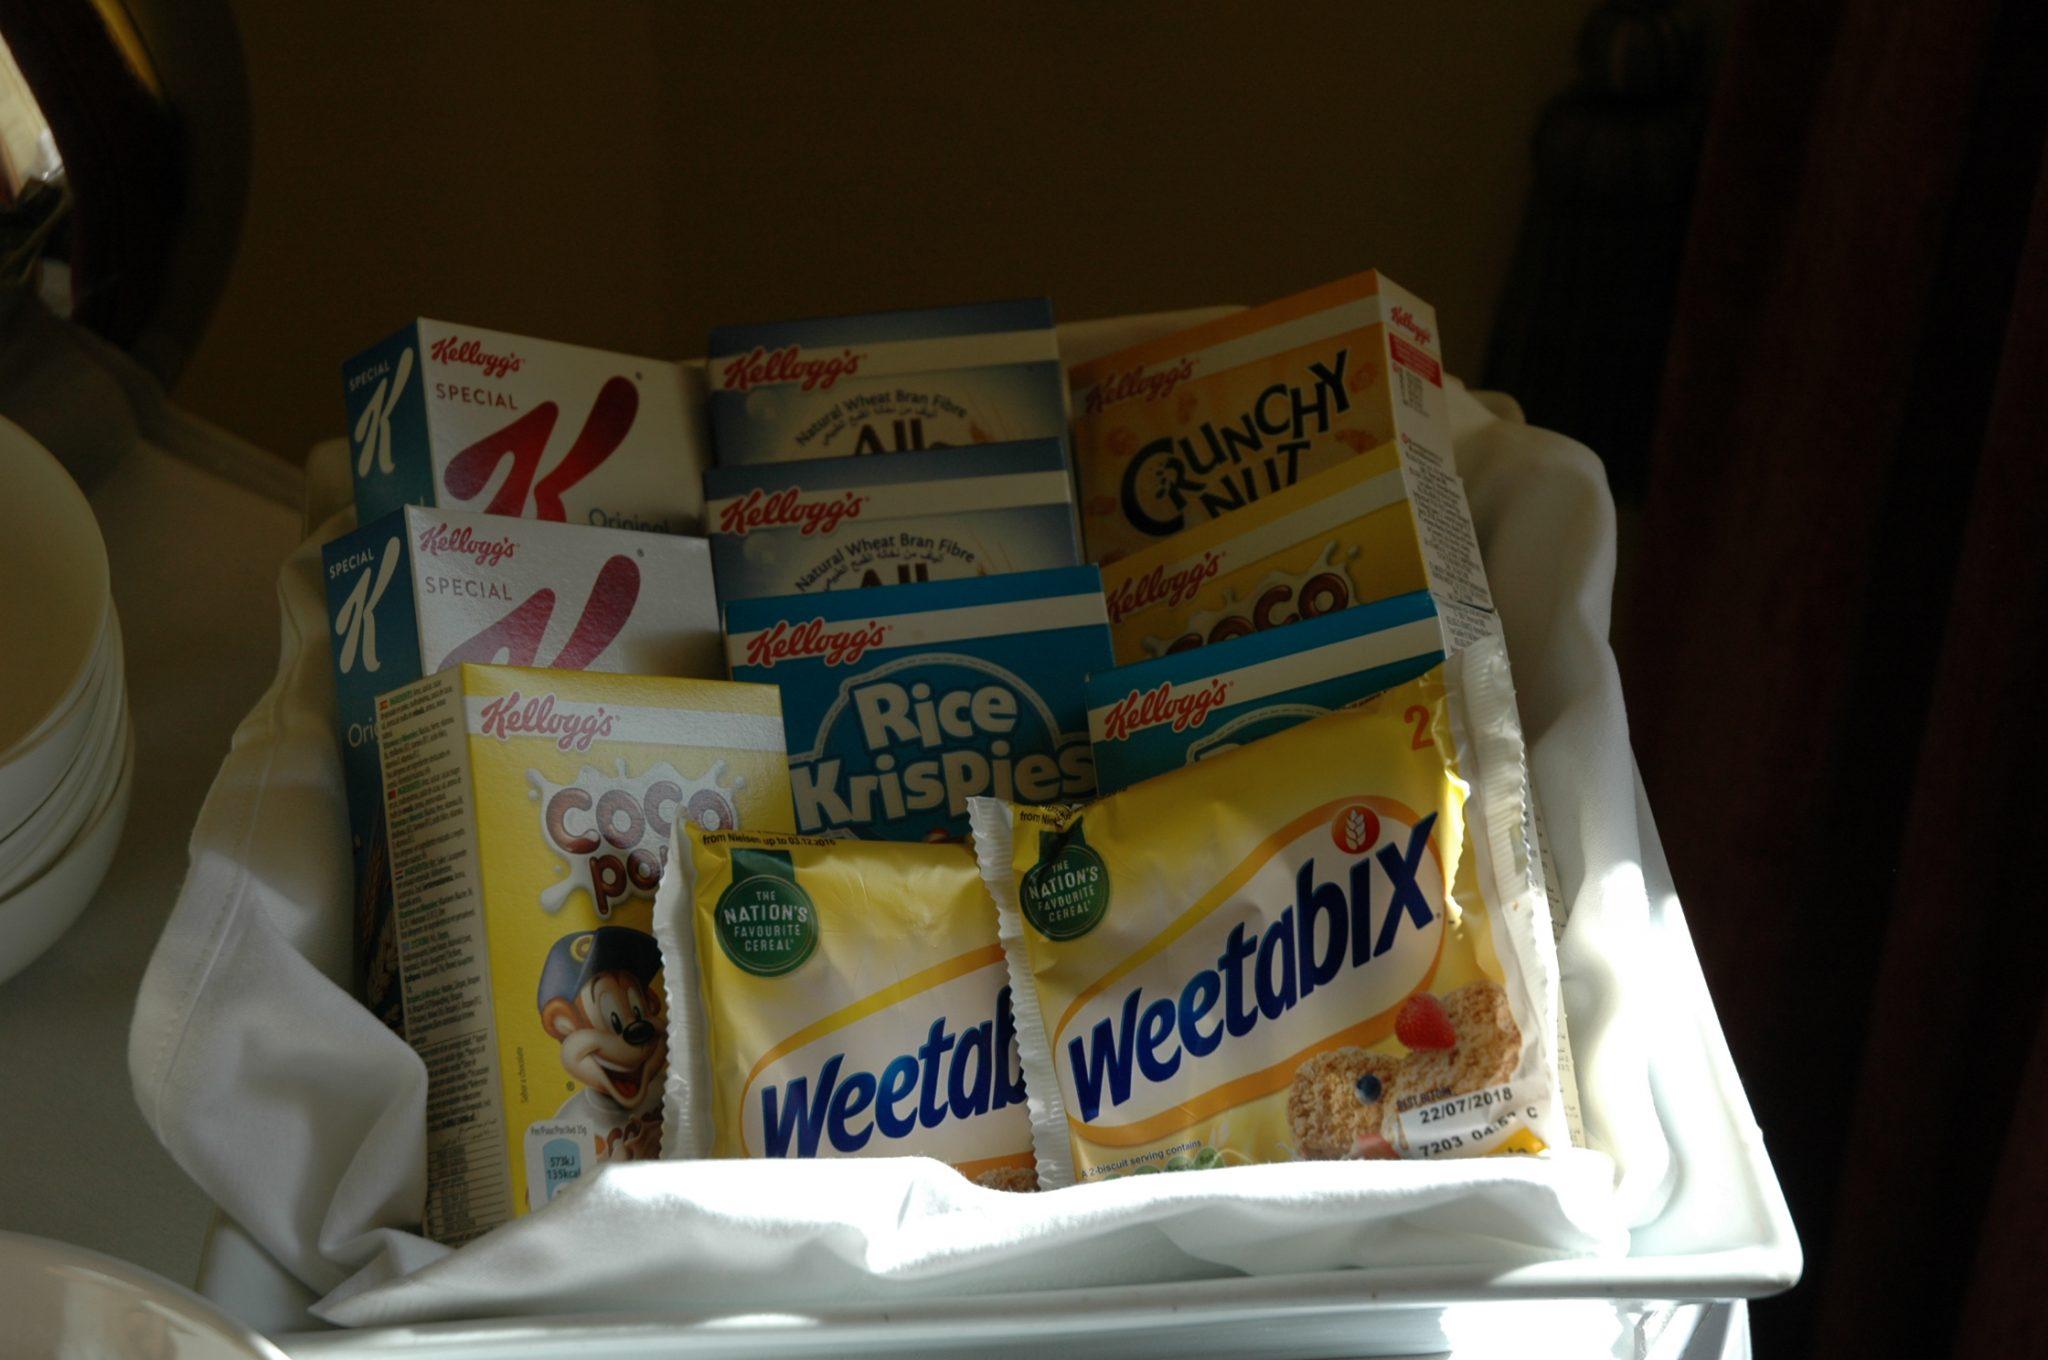 Selection of breakfast cereals